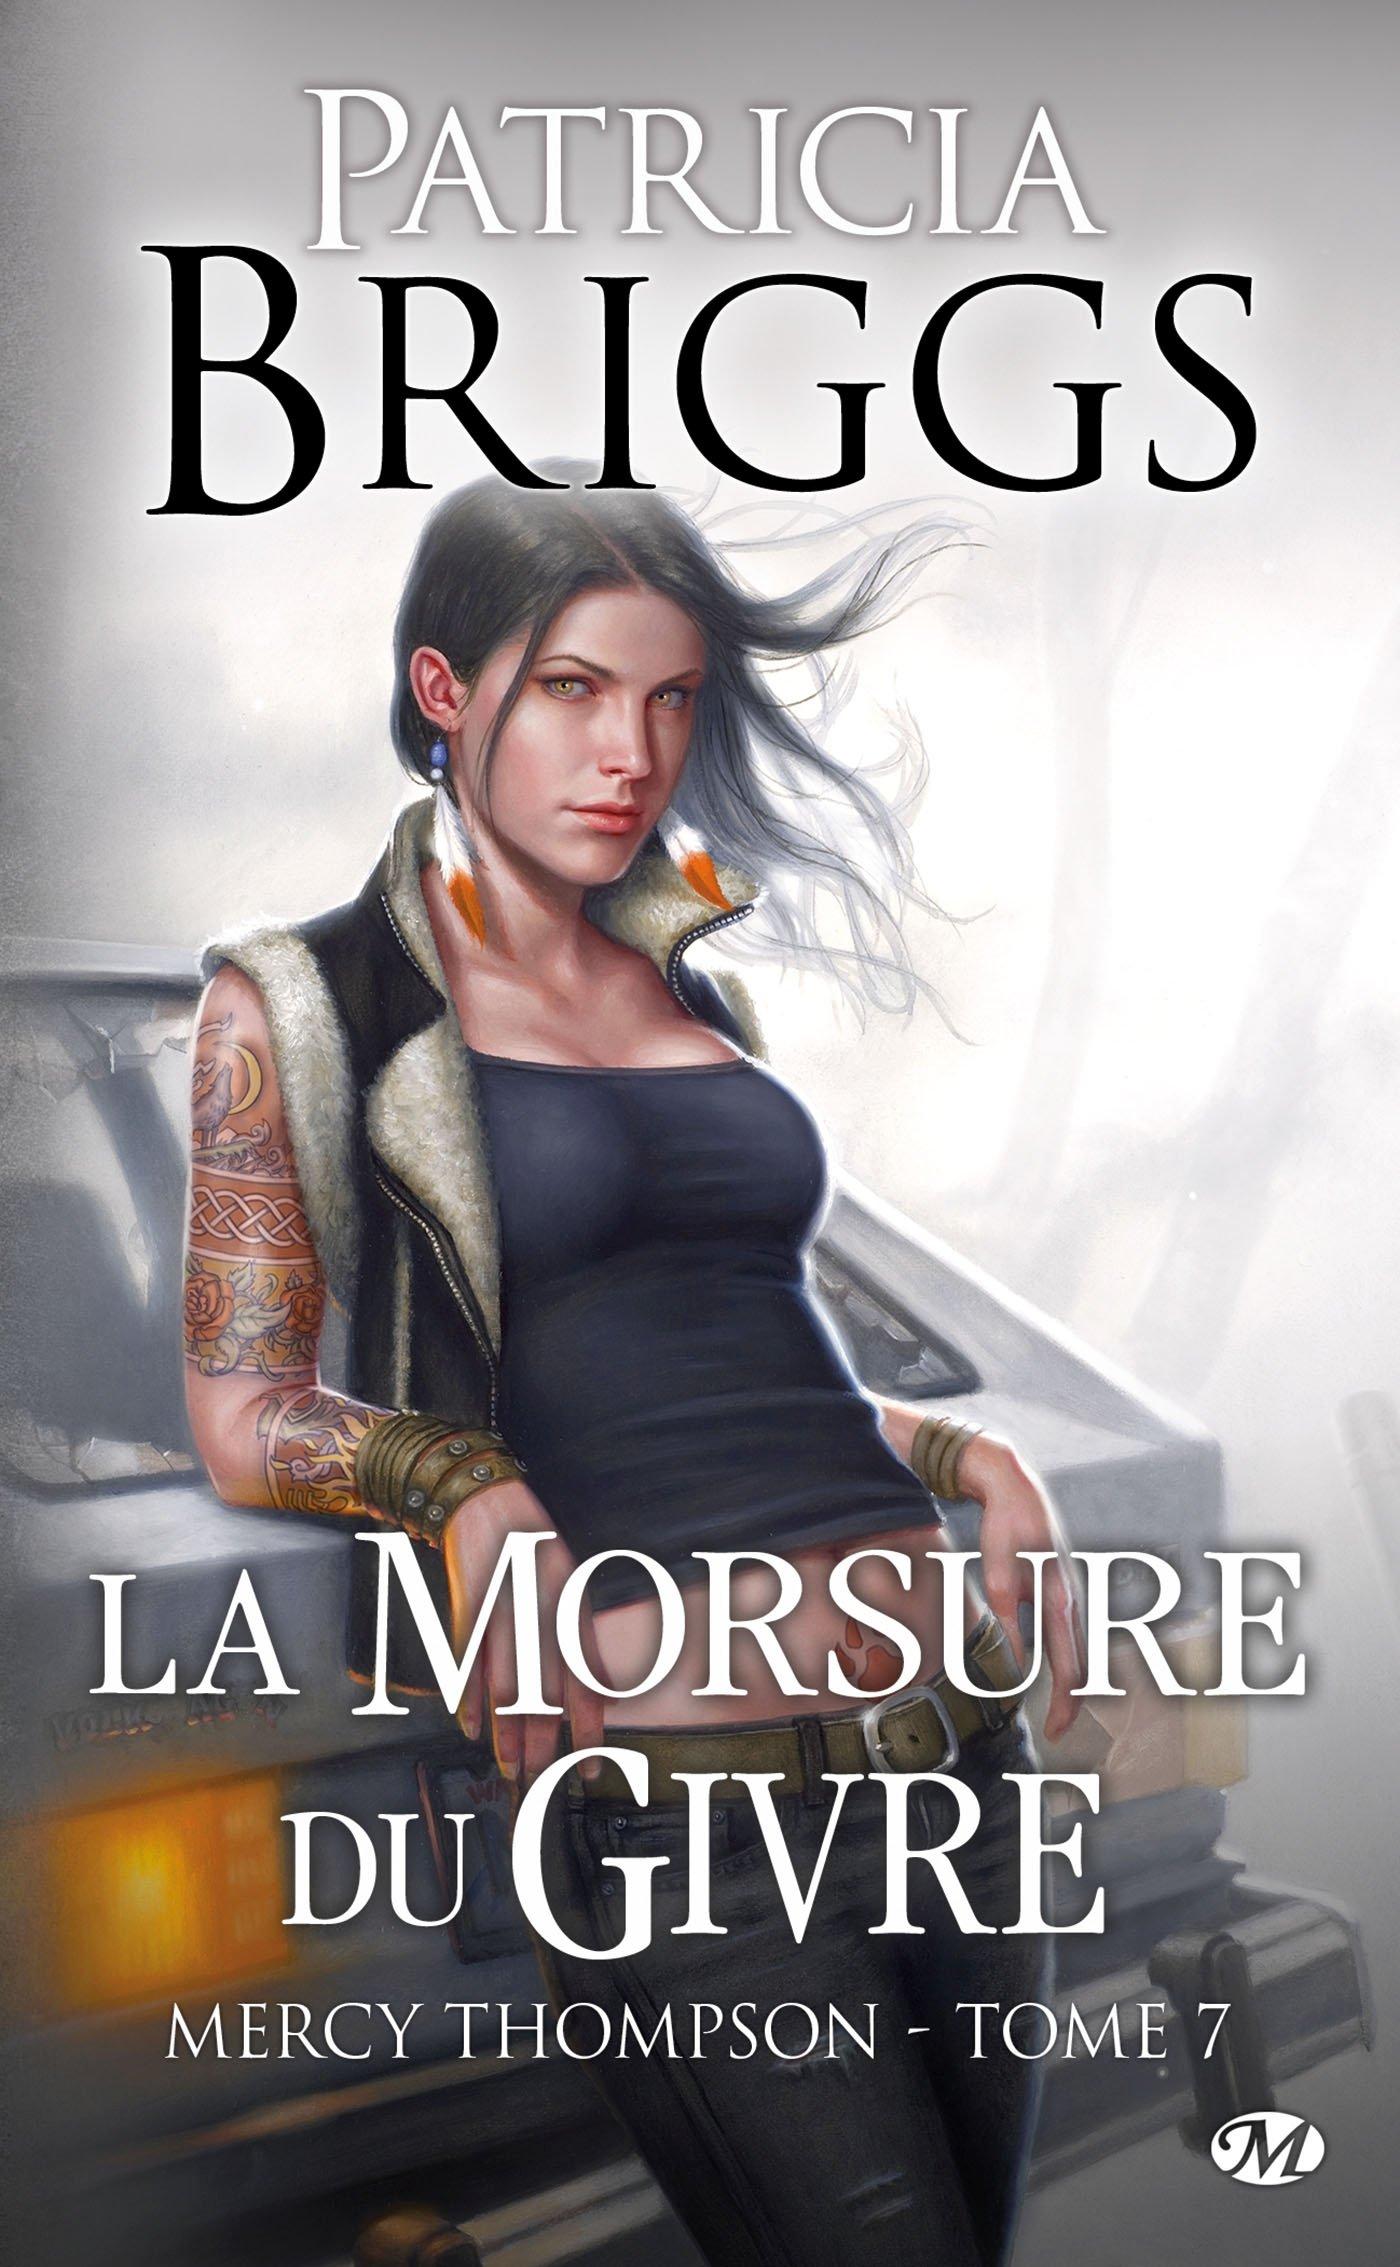 Mercy Thompson, Tome 7: La Morsure du givre Broché – 28 mars 2014 Patricia Briggs Milady 2811211640 Roman Sentimental paranormal